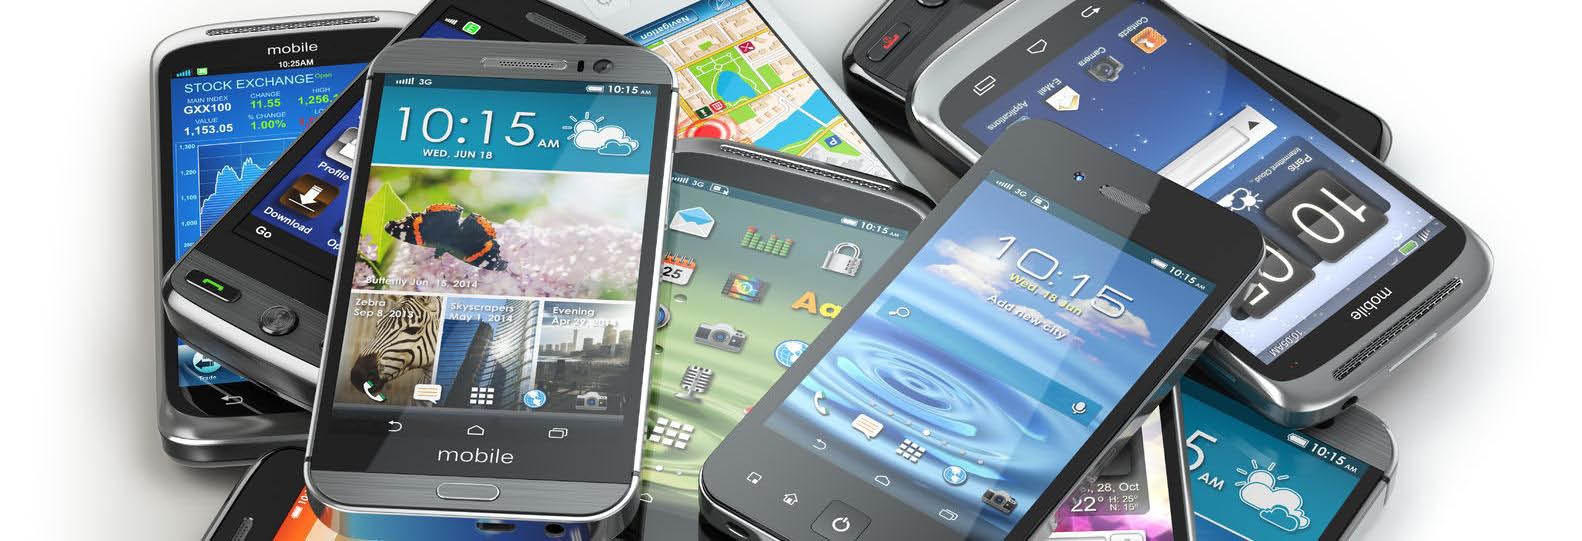 Ultra Mobile - Cellwave Wireless Banner